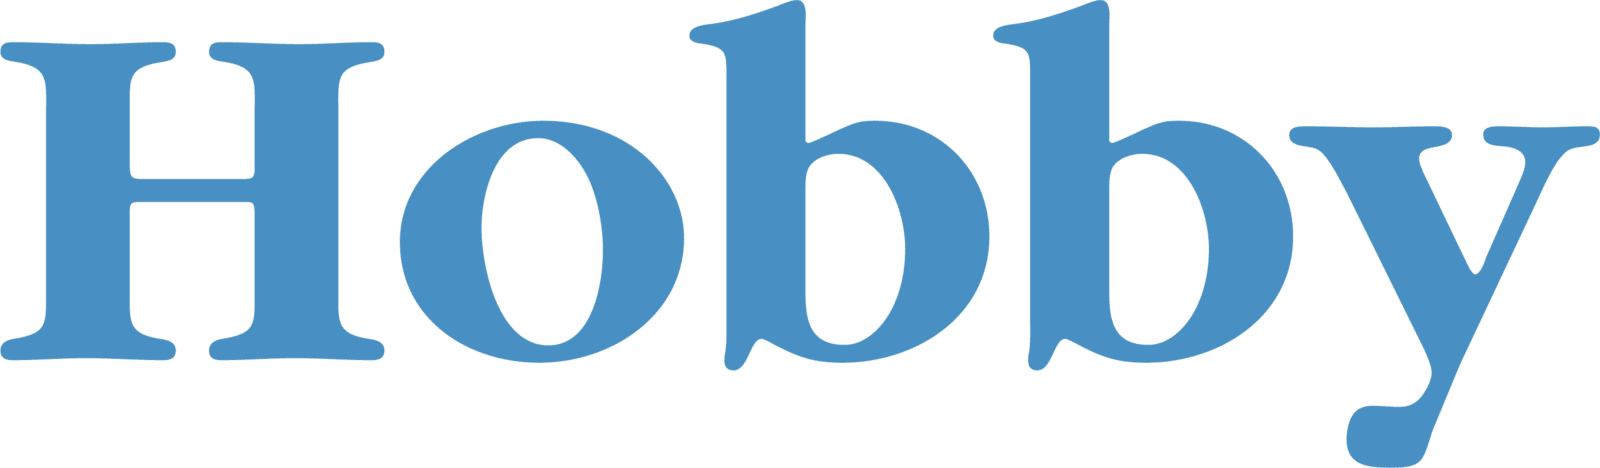 Logo obytných aut HOBBY